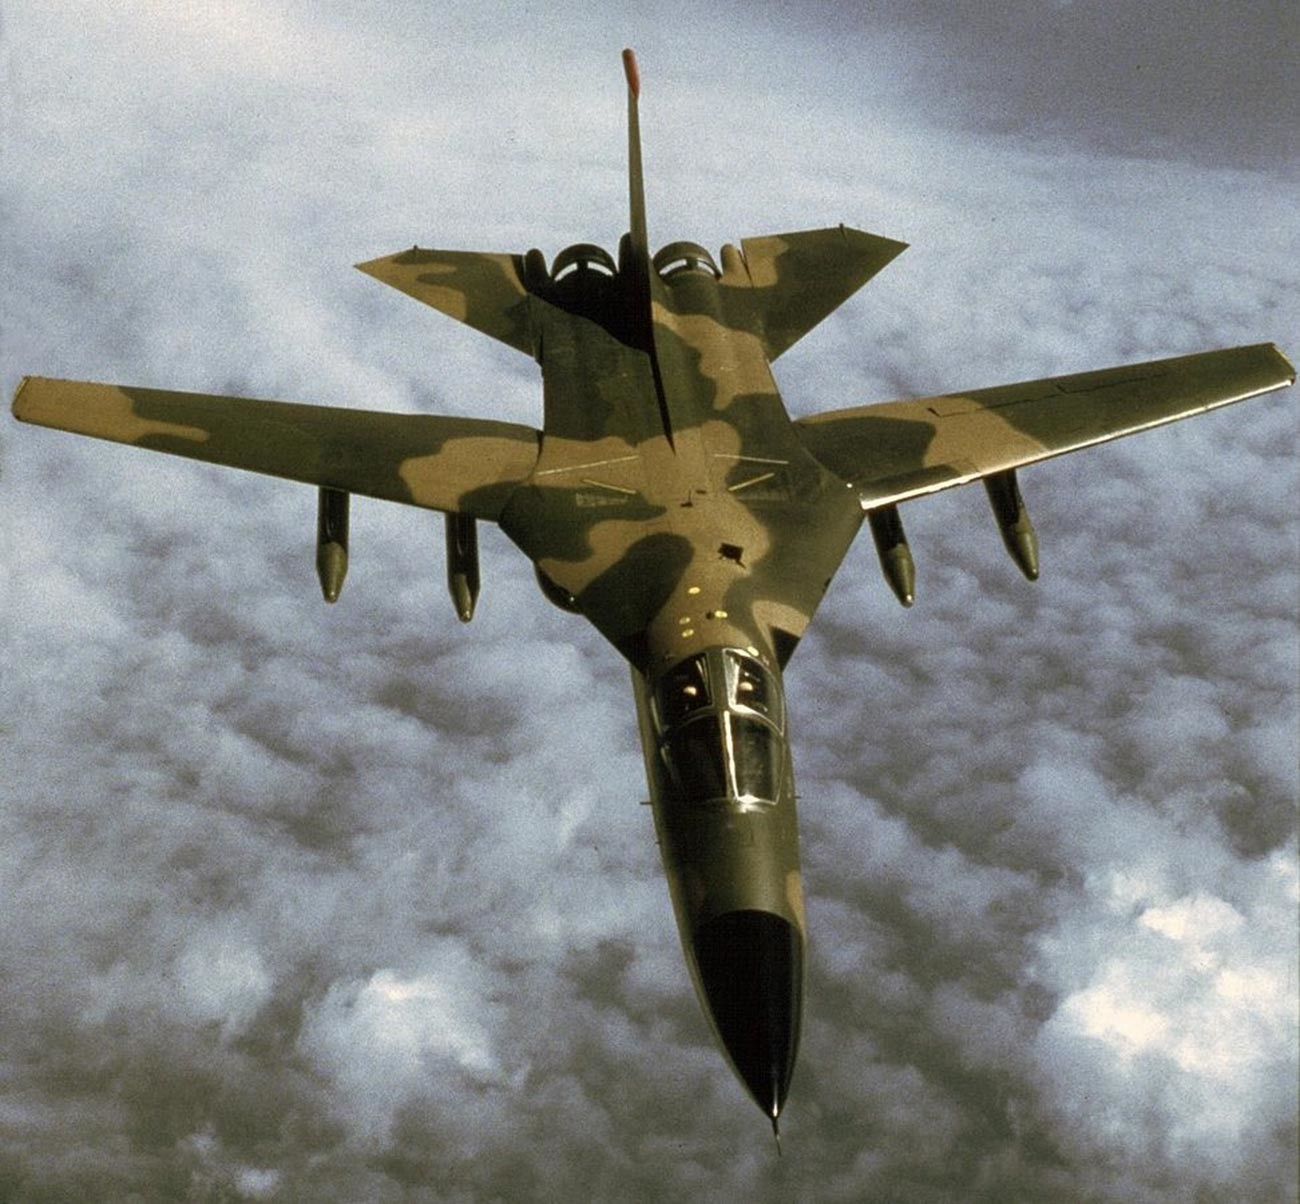 F-111 Aardvark.